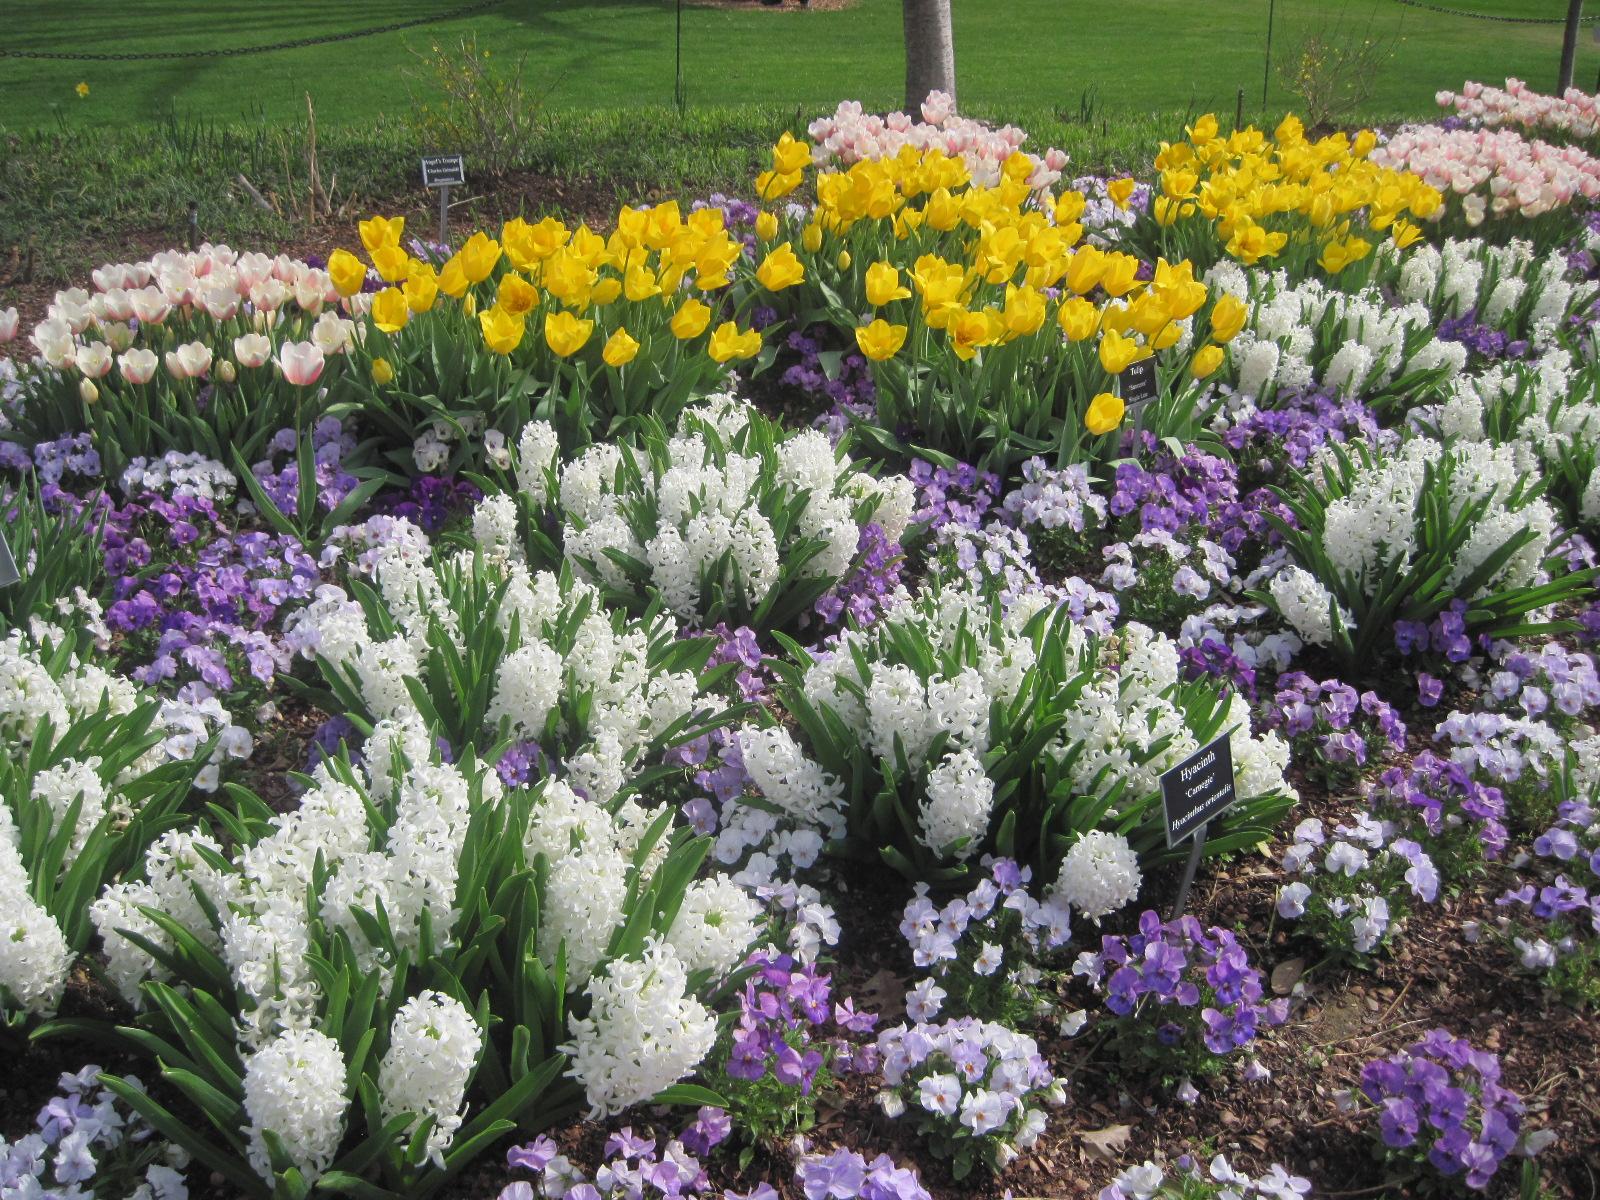 петуния какие цветы сажают весной на даче фото для